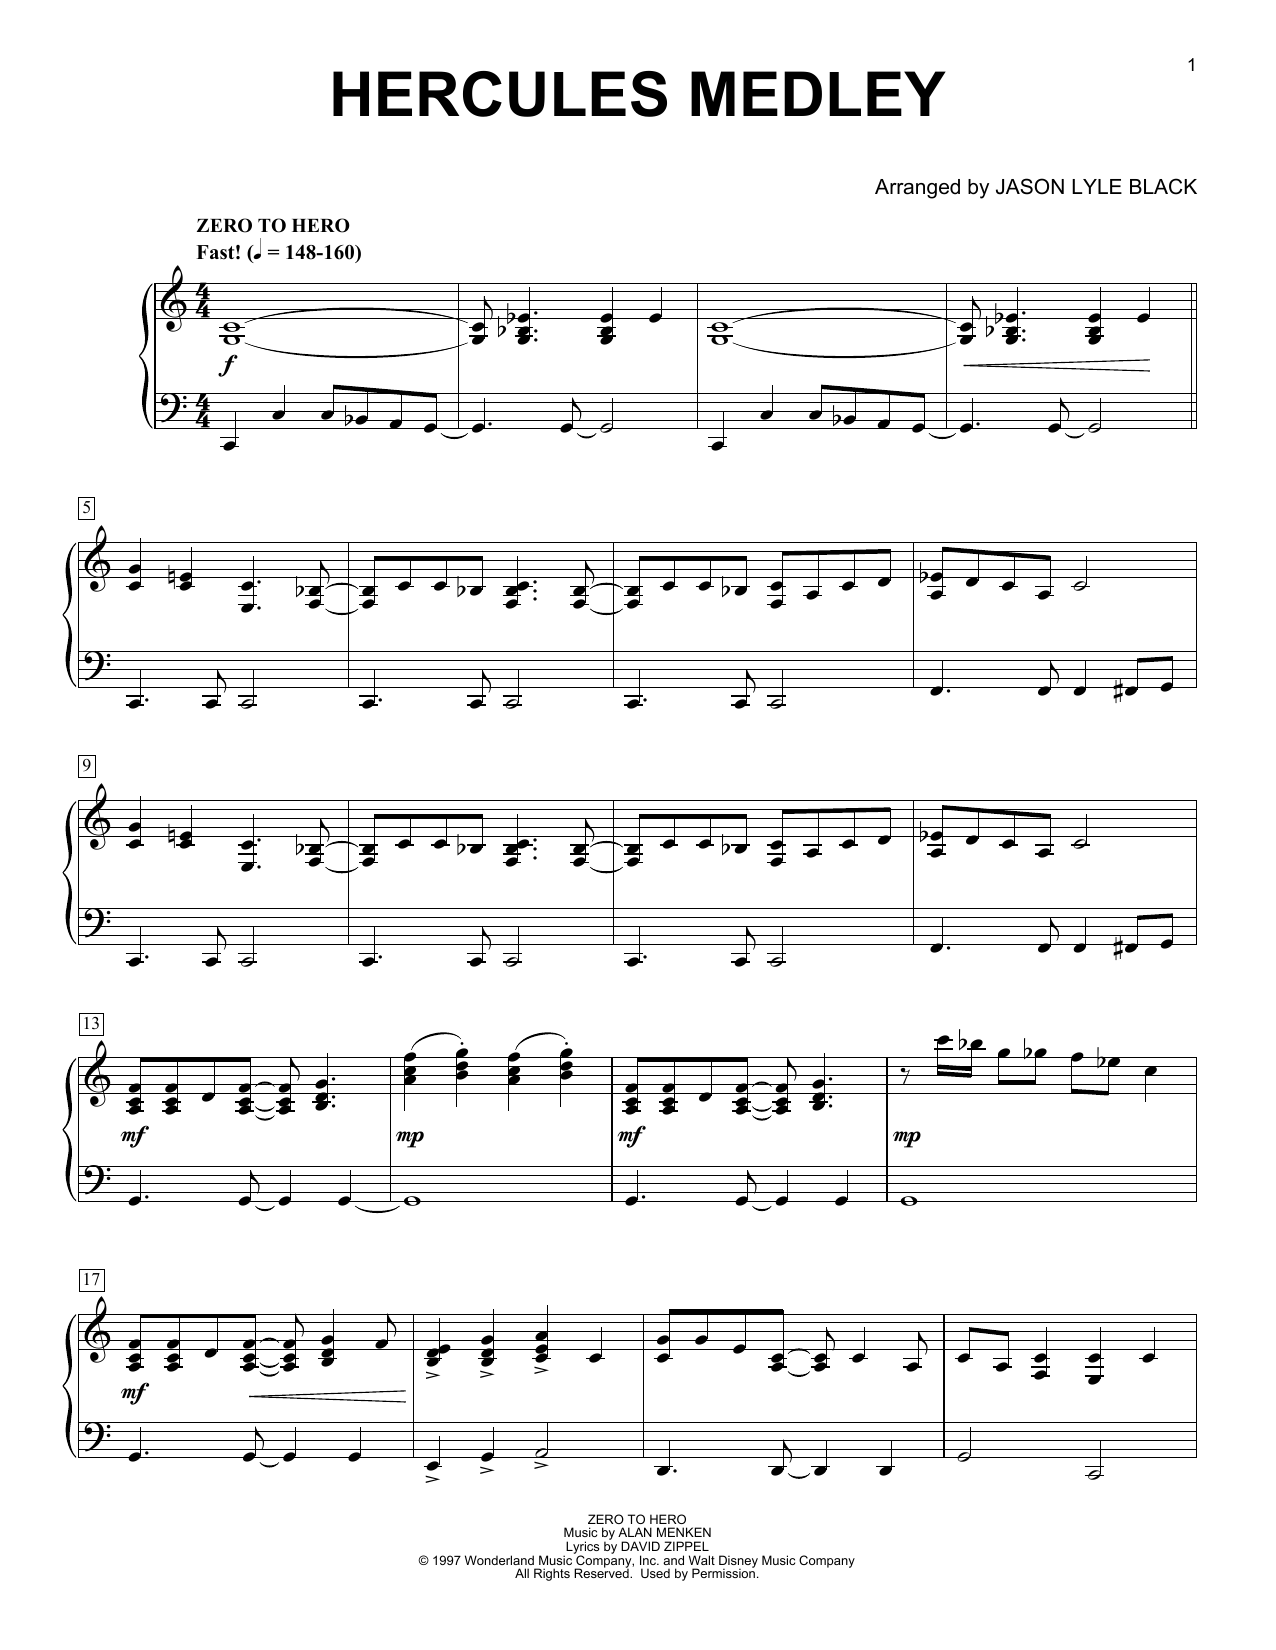 Alan Menken & David Zippel Hercules Medley (arr. Jason Lyle Black) sheet music notes and chords. Download Printable PDF.